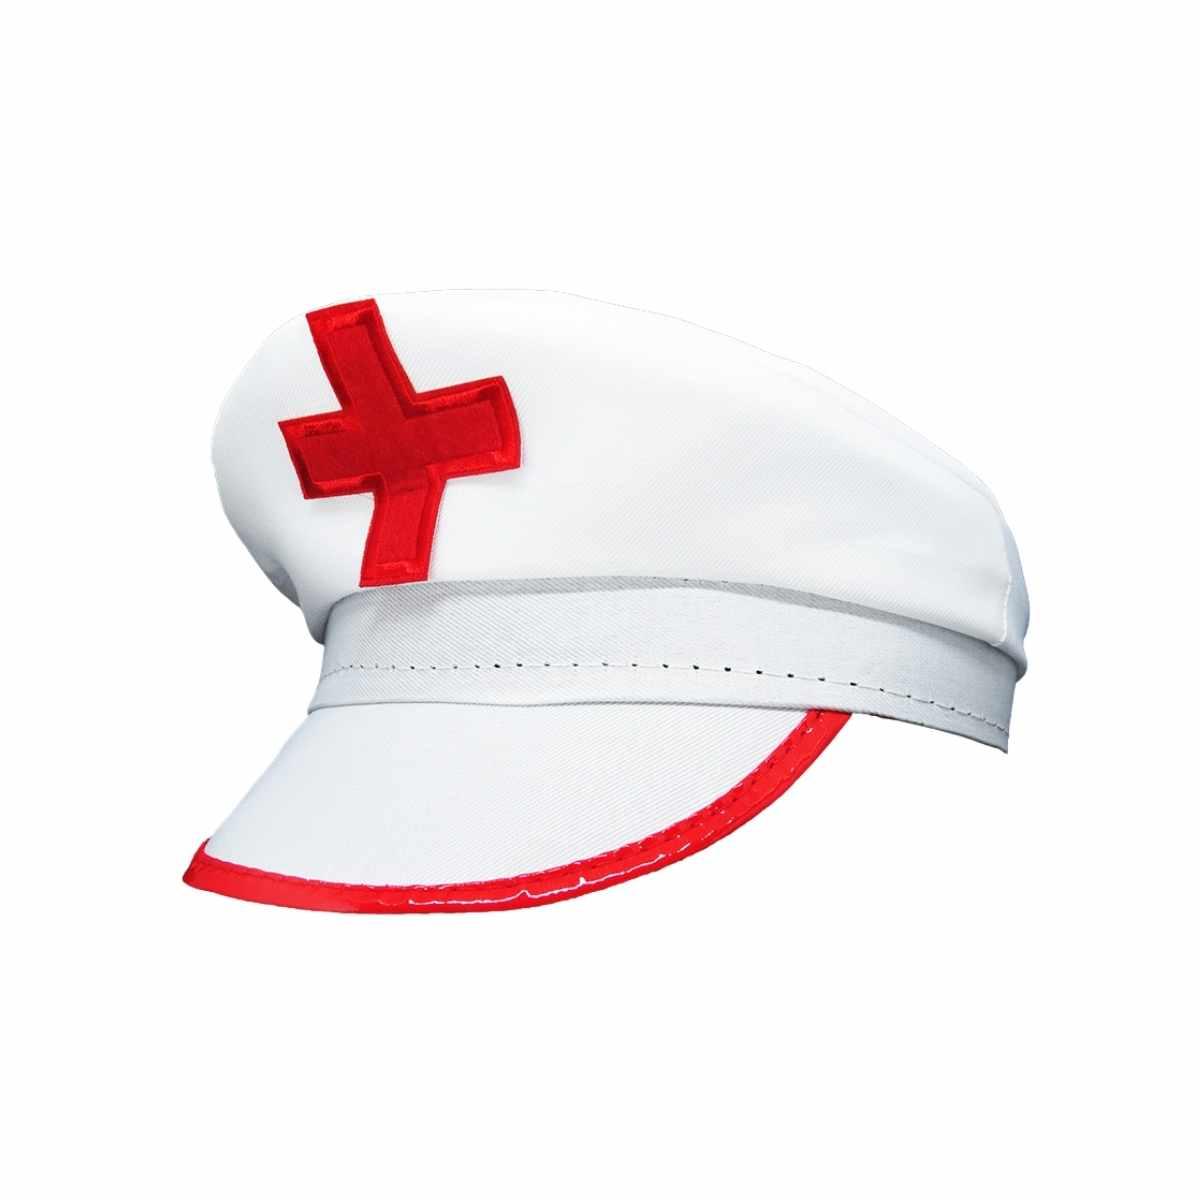 Kit Enfermeira Completo (Saia de Tule Branca Adulta + Quepe Enfermeira + Suspensório Branco + Meia Calça Enfermeira)